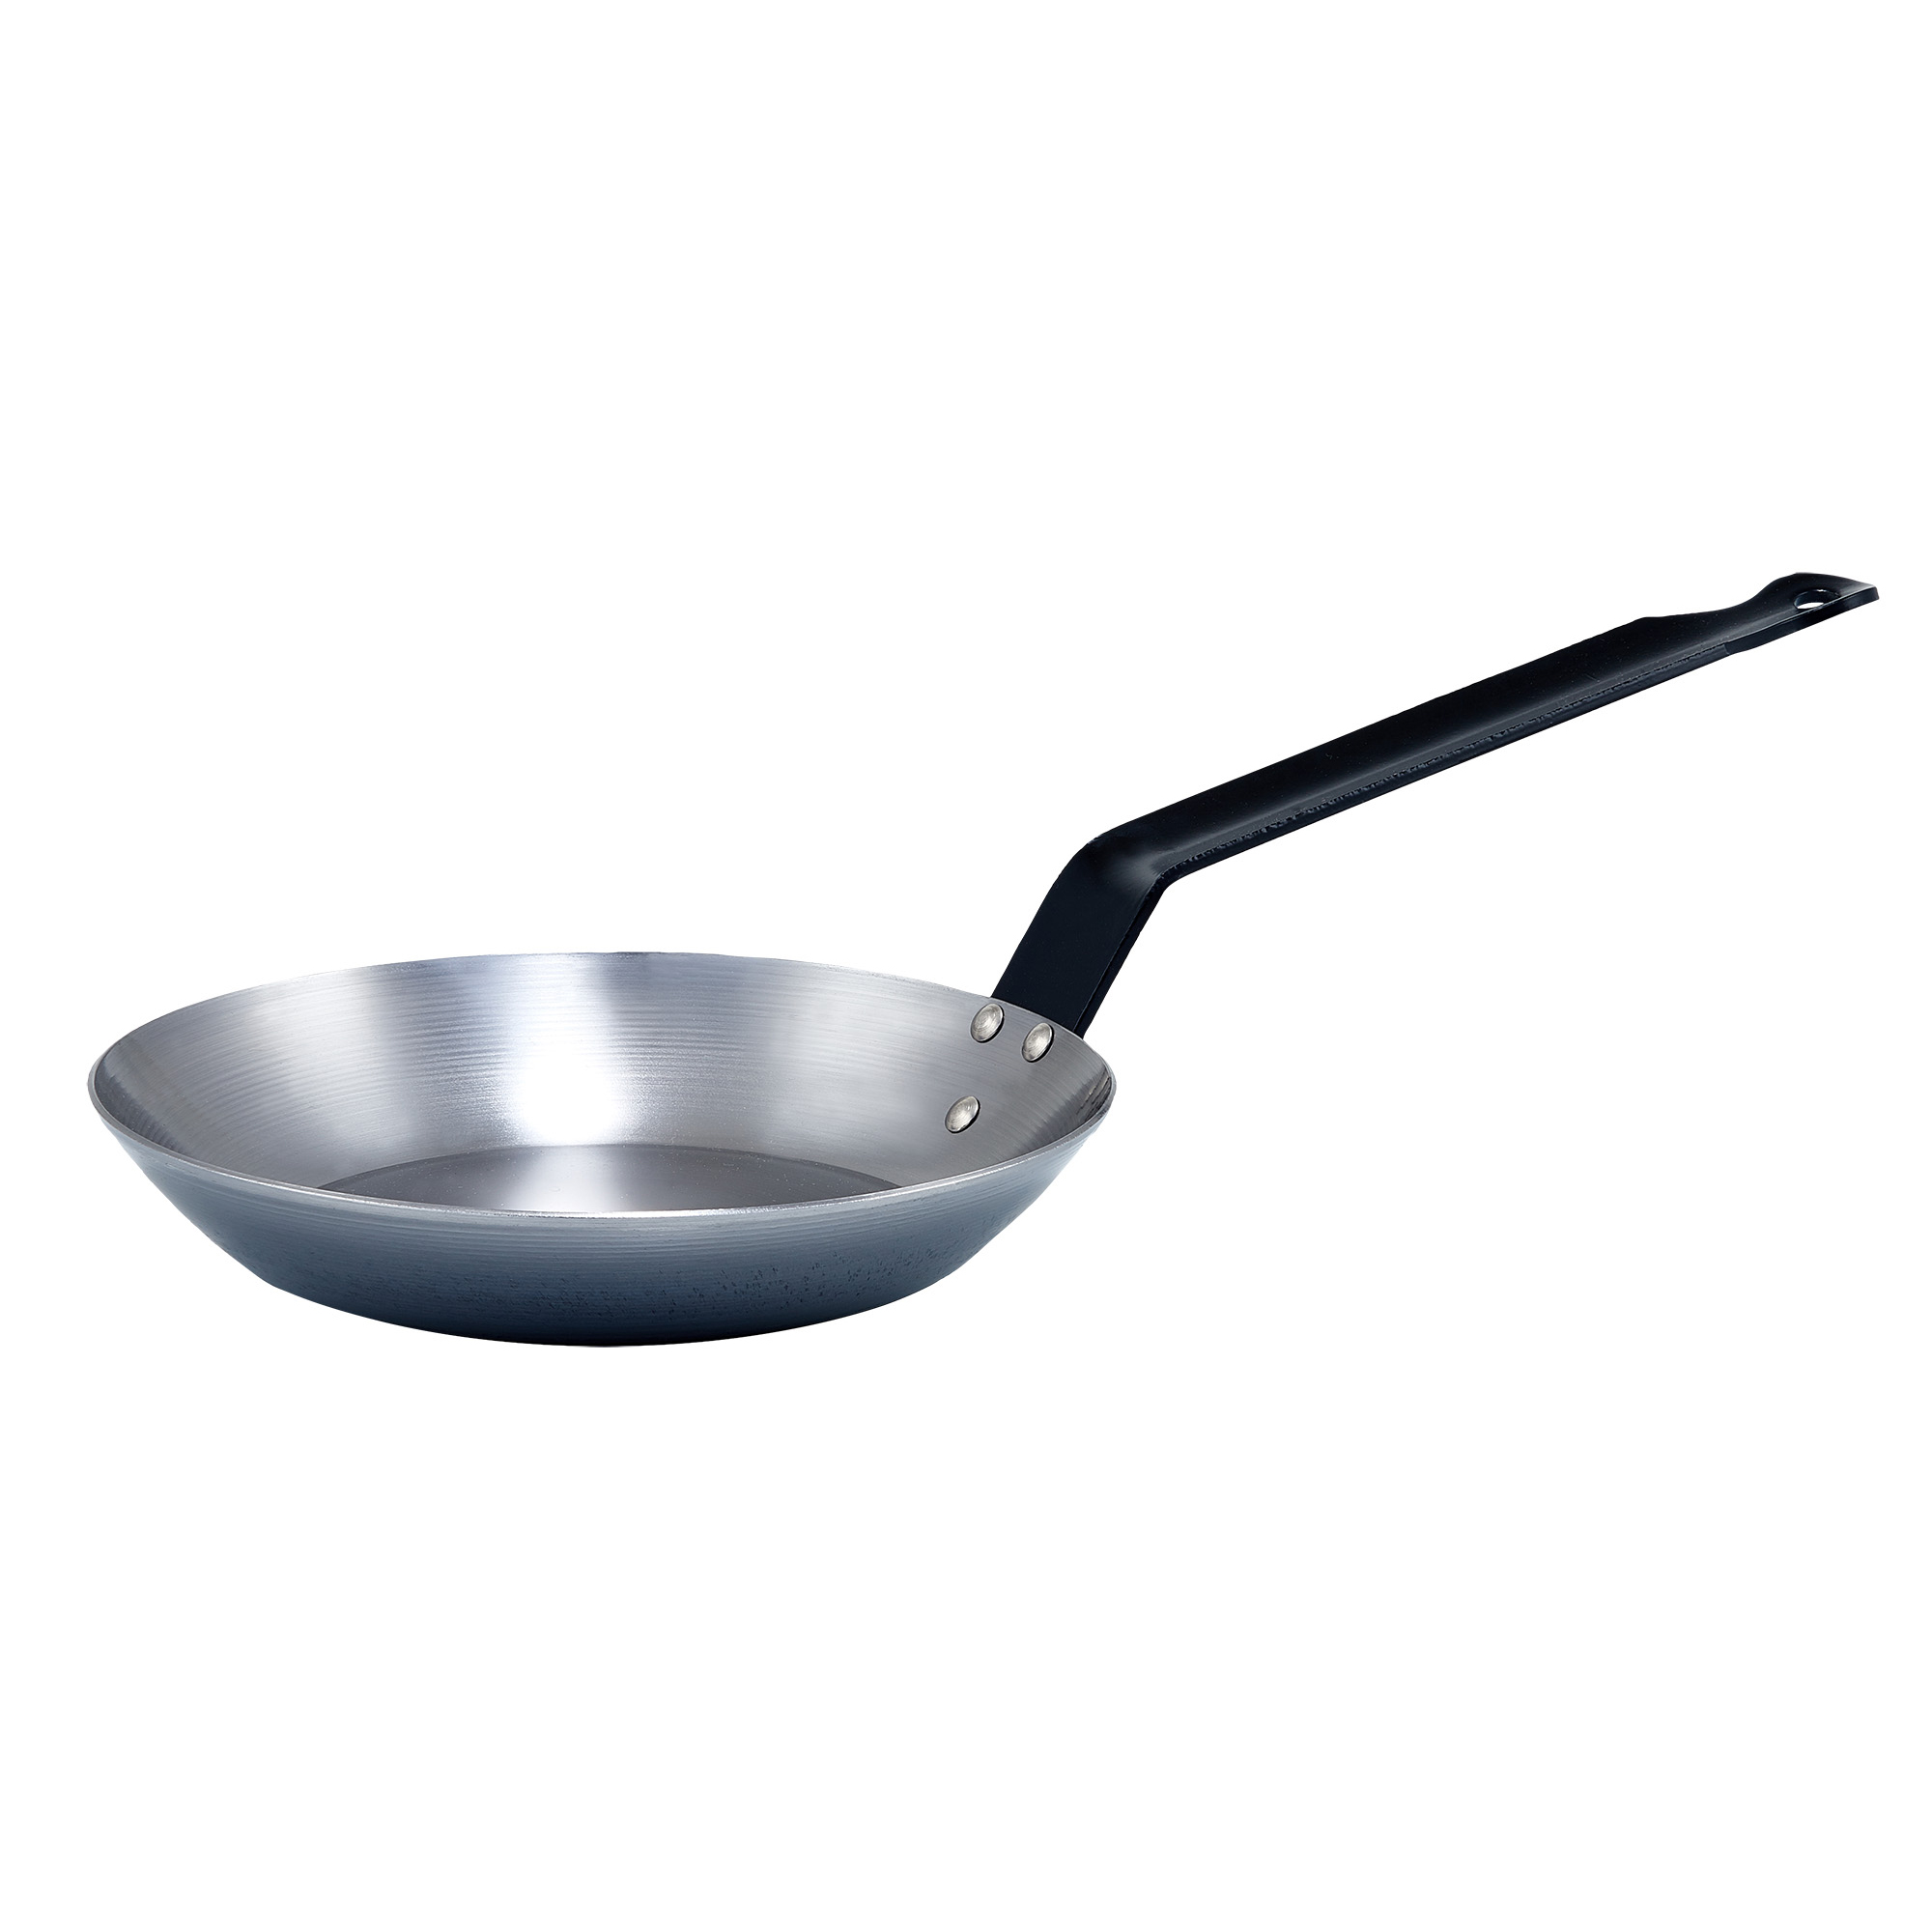 Winco CSFP-12 fry pan